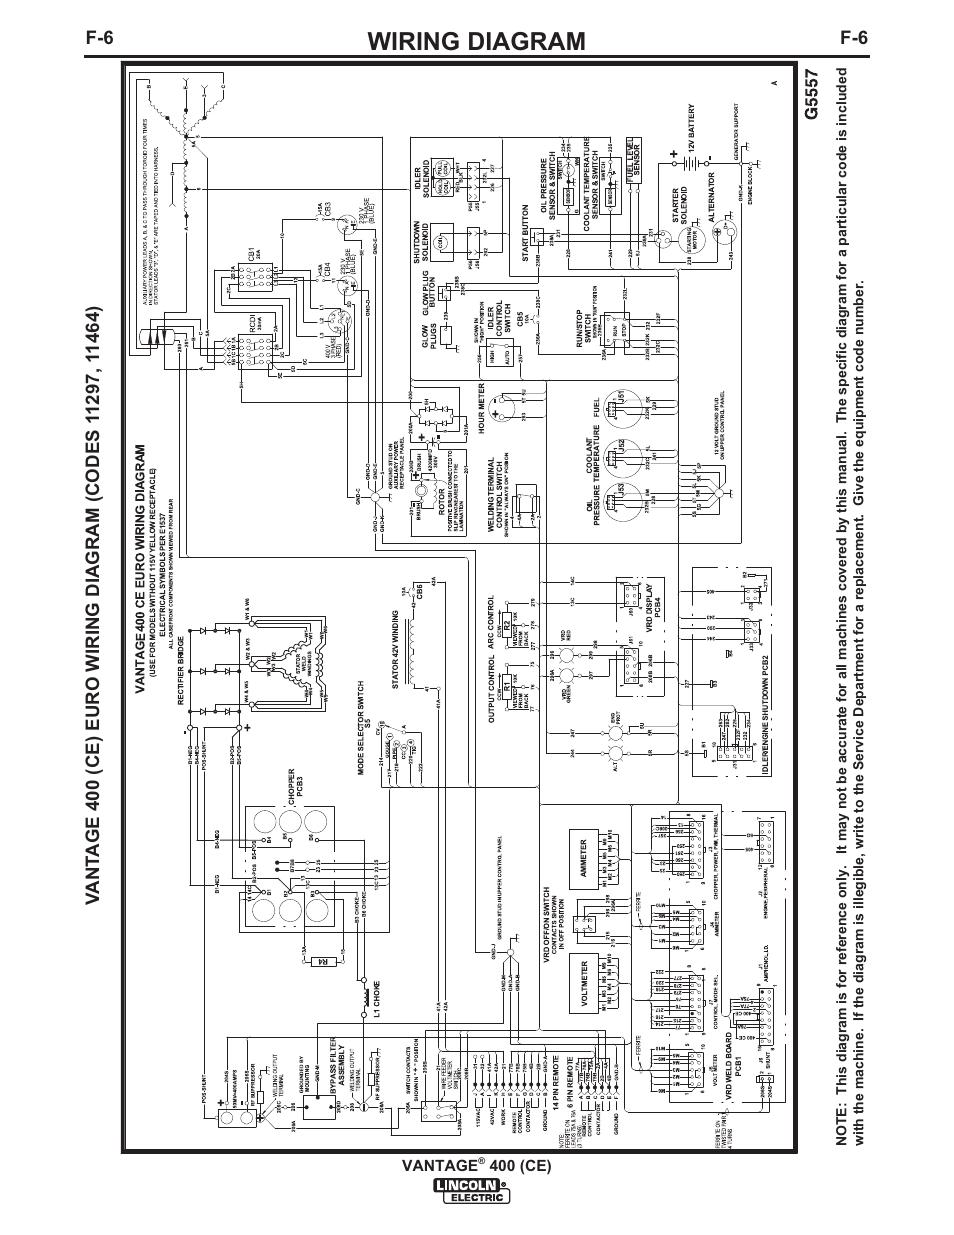 hight resolution of pioneer fh p8000bt wiring diagram color code pioneer fh pioneer avh p4000dvd wiring diagram pioneer avh p4000dvd wiring diagram